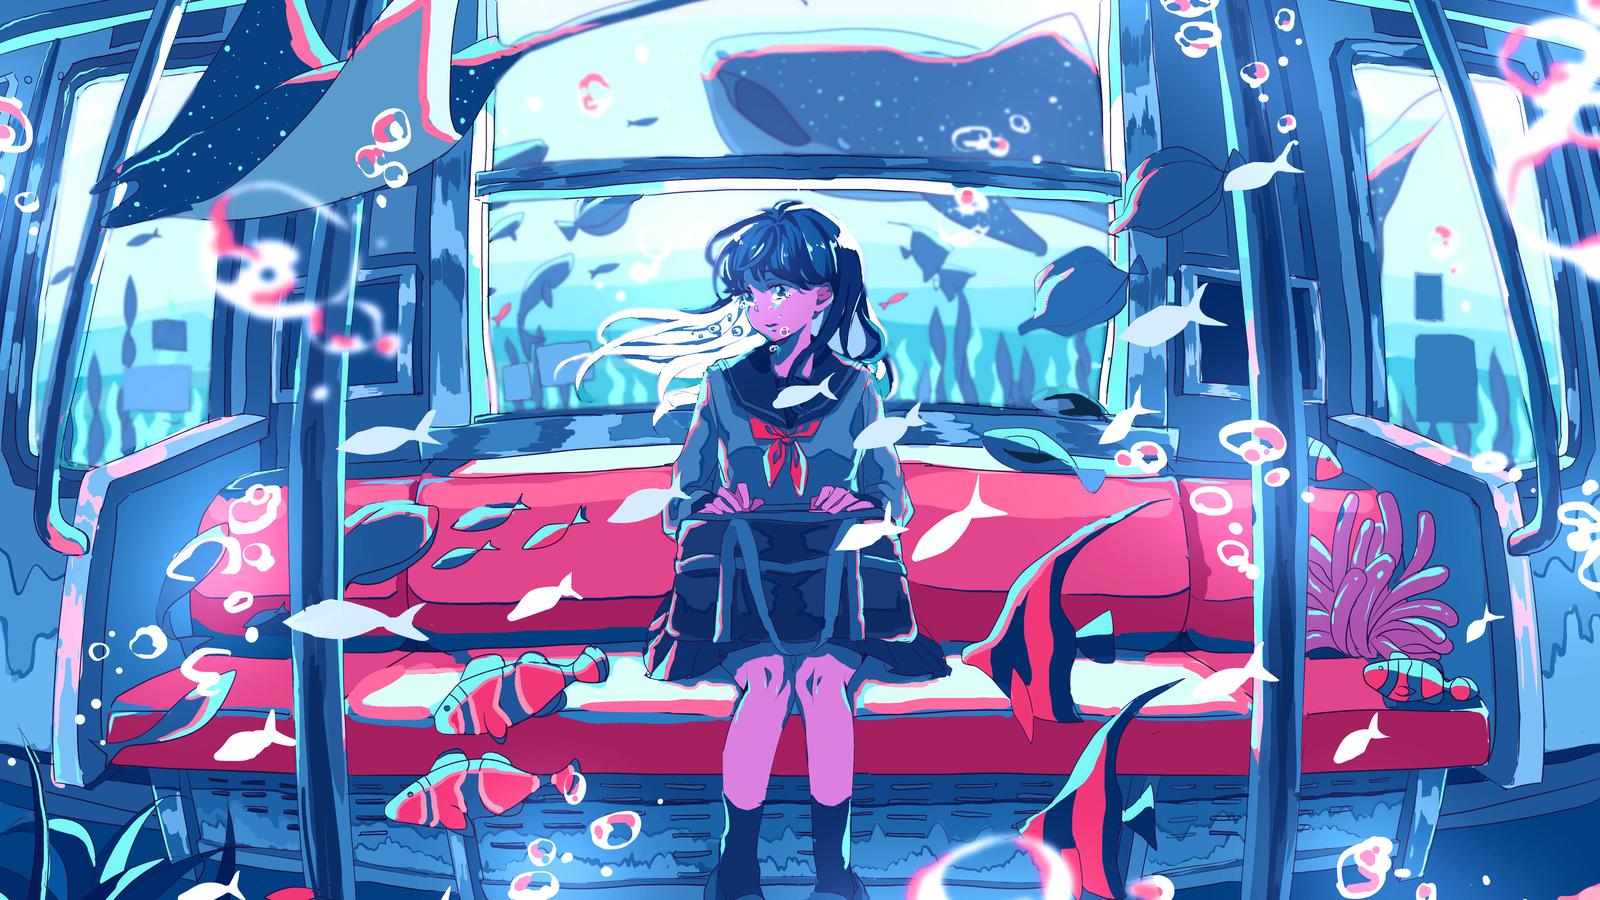 underwater-anime-girl-bubble-4k-vl.jpg